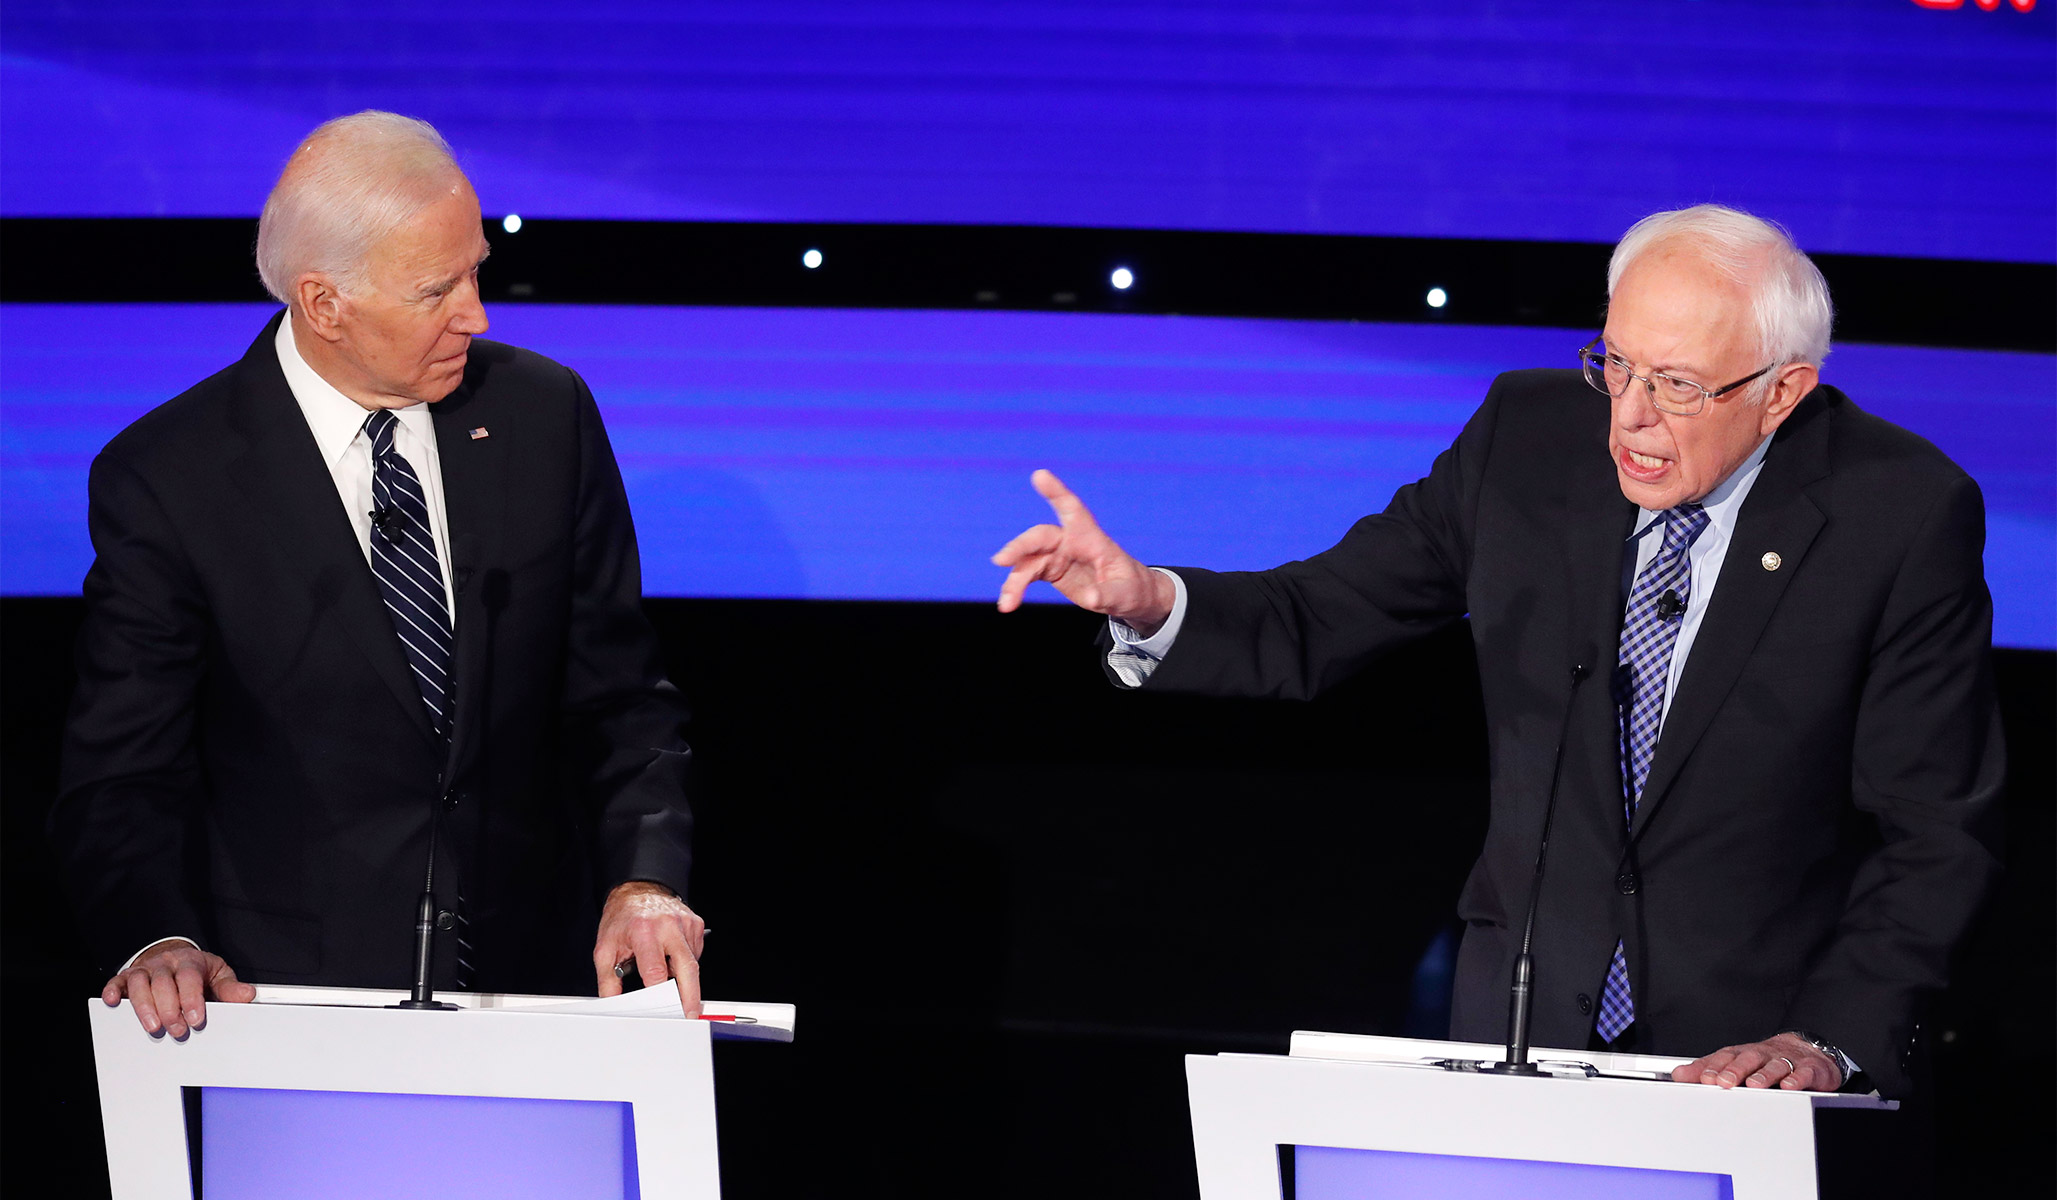 Bernie Cites Biden's NAFTA Support as Evidence He Prioritizes Corporations Over Workers